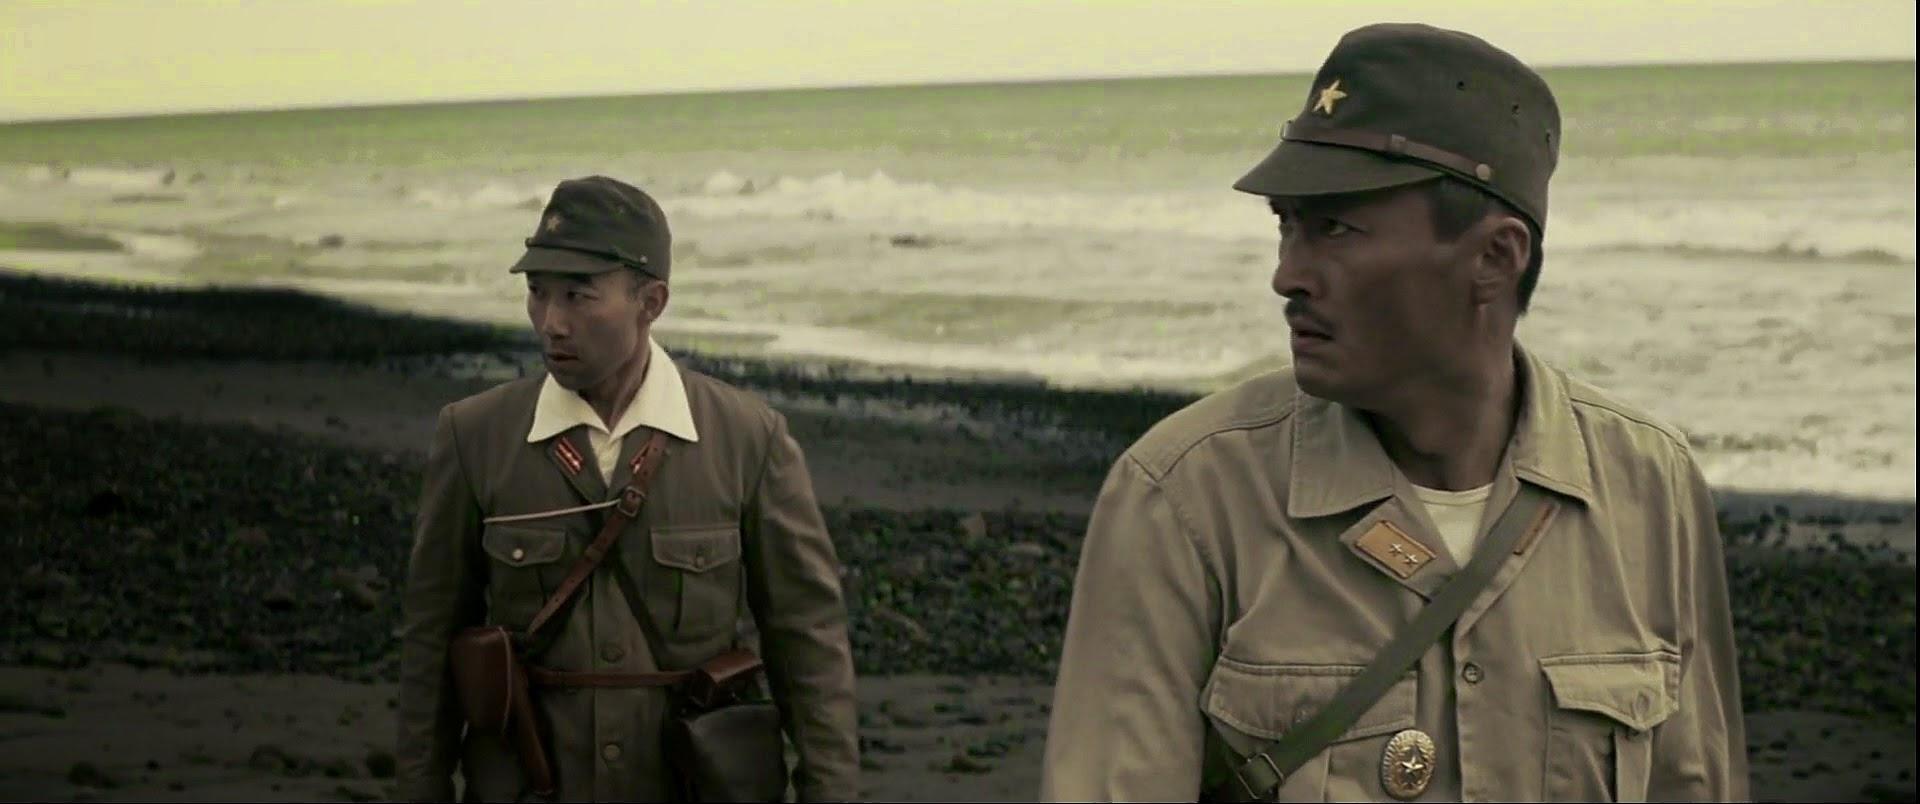 Cartas Desde Iwo Jima (2006) HD 1080p Latino-Japones